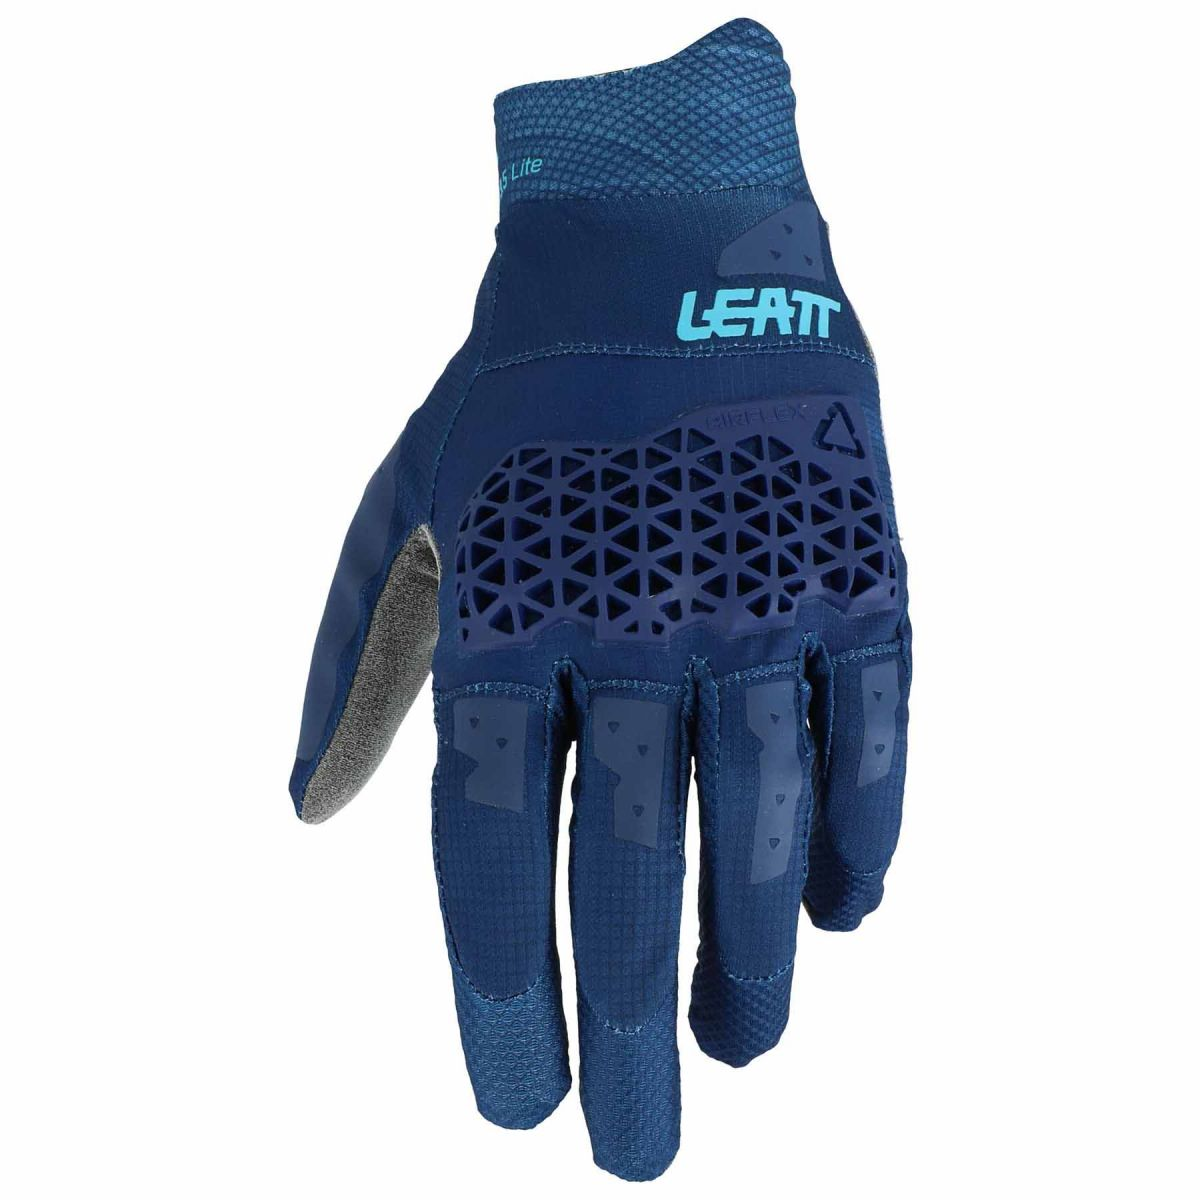 Leatt Moto 3.5 Lite Blue перчатки